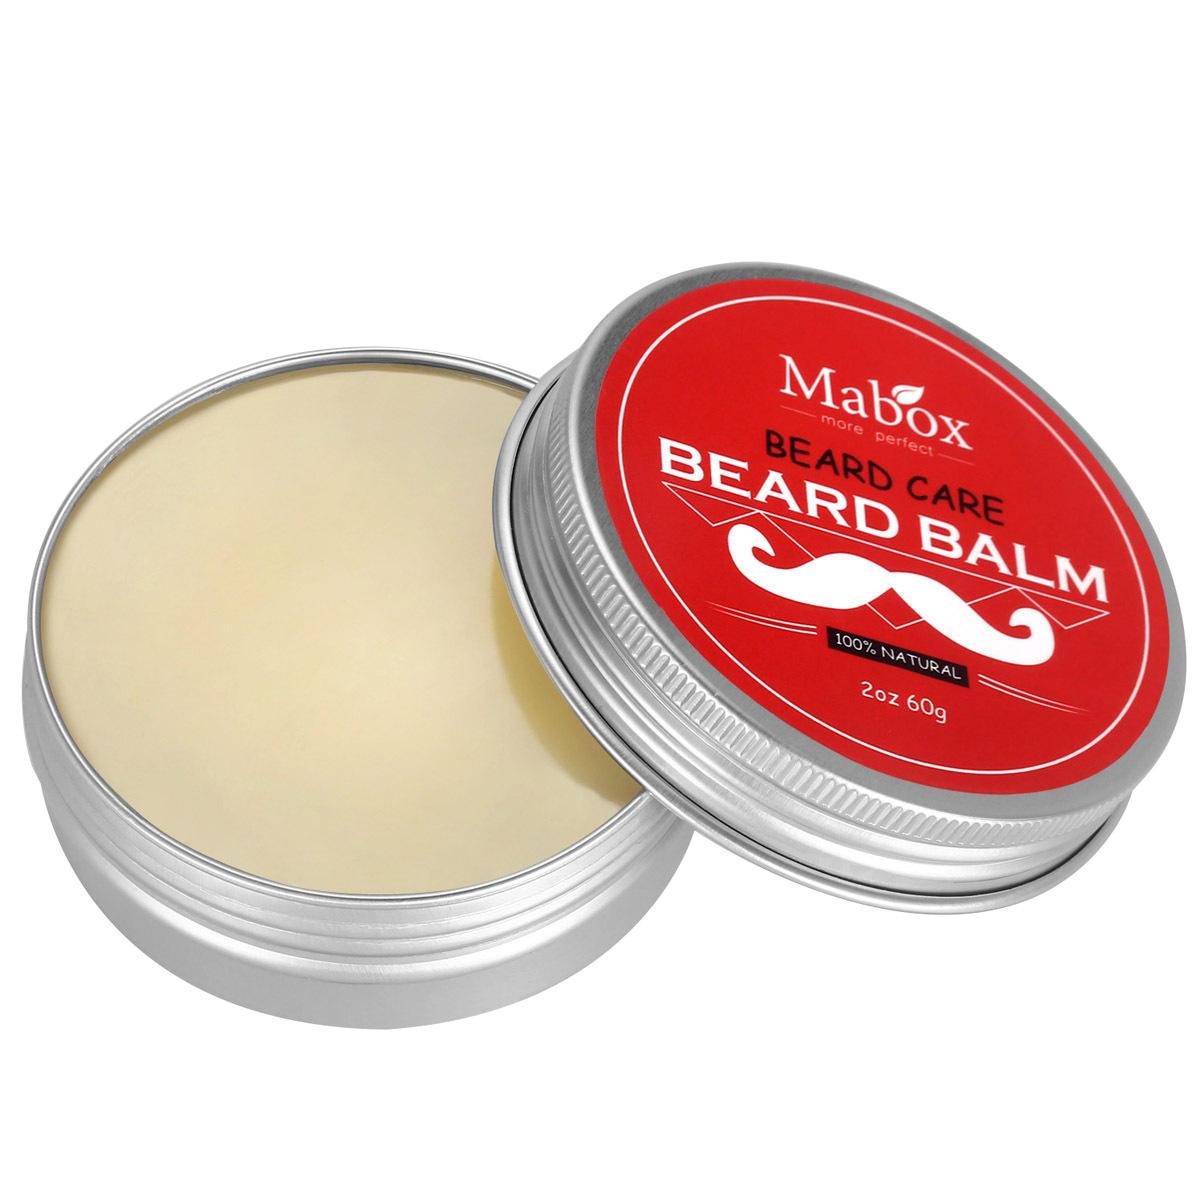 Mabox Beard Balm Moustache Wax for Men Styling Moisturizing Smoothing Conditioner Beard Care 60g